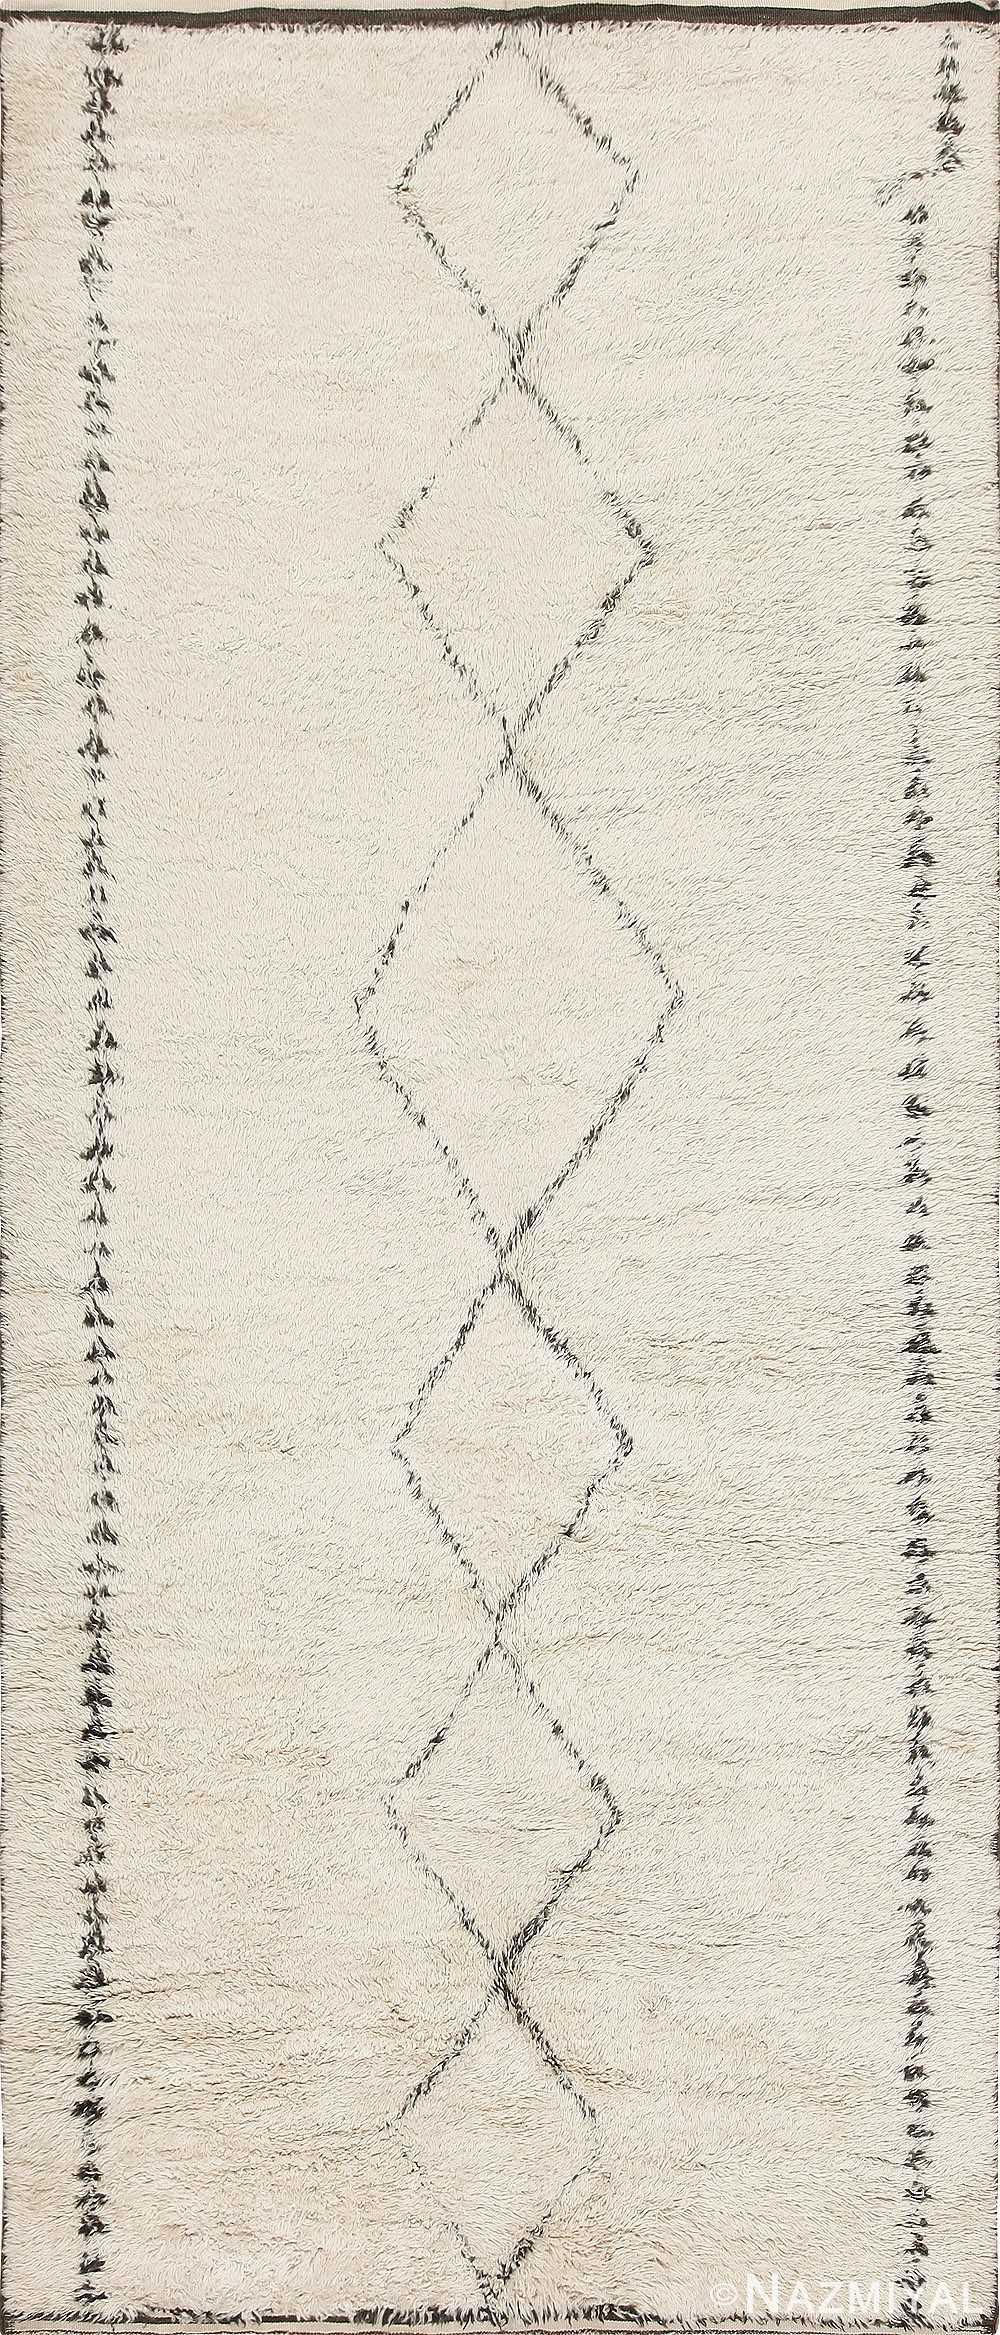 Ivory and Black Vintage Moroccan Beni Ourain Shag Rug 47891 Nazmiyal